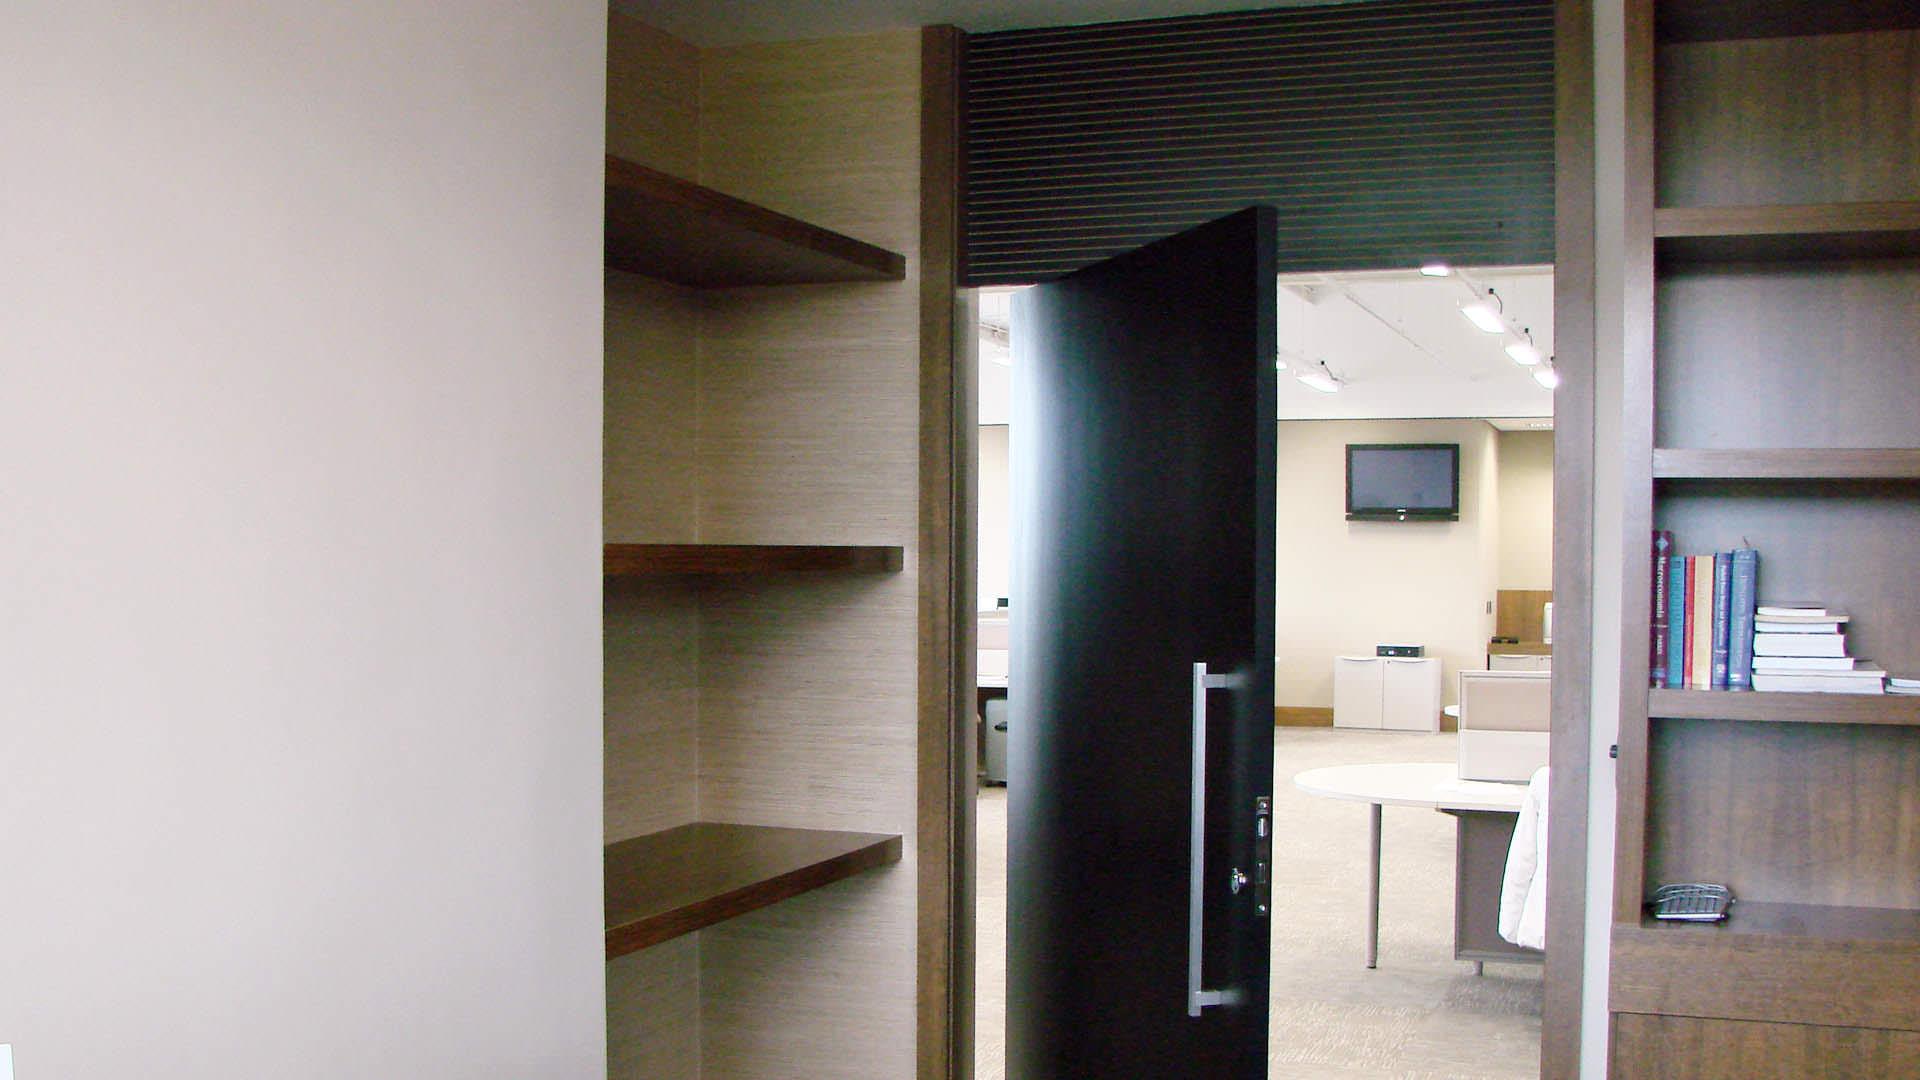 porta pivotante sob medida móveis planejados ambiente corporativo